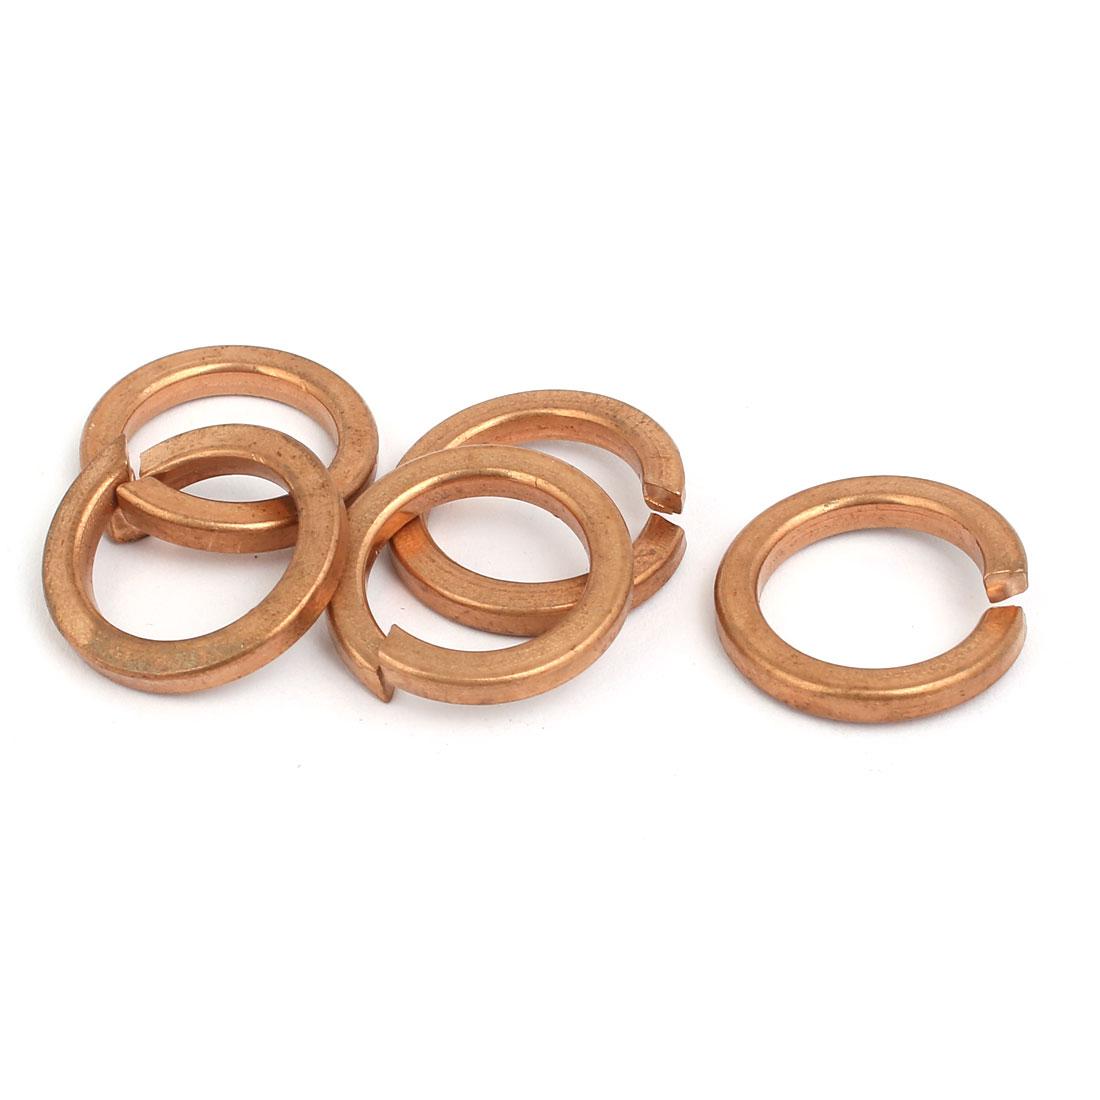 16mm Inner Diameter Split Lock Spring Washer Gasket Copper Tone 5pcs